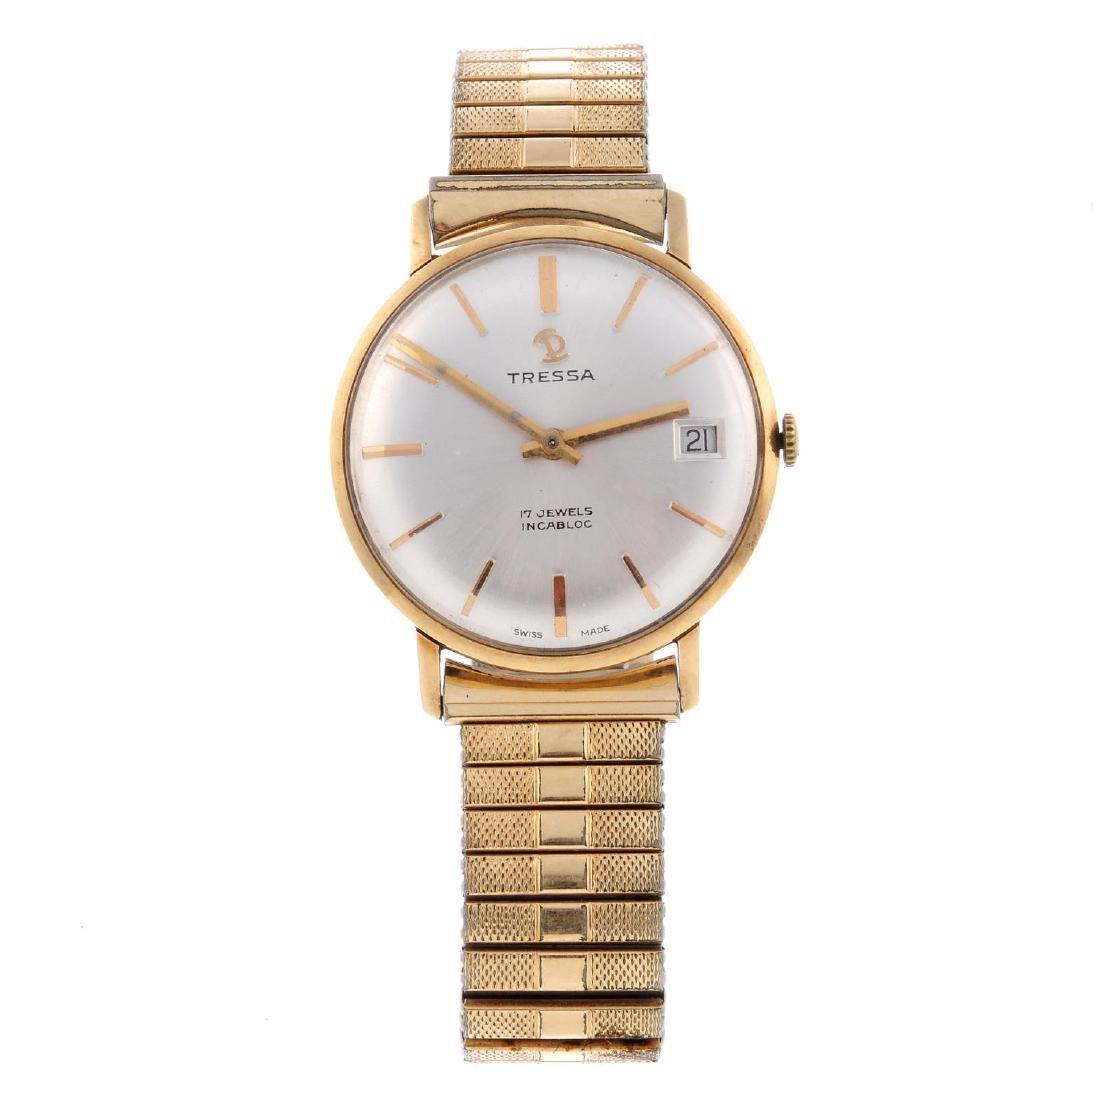 TRESSA - a gentleman's bracelet watch. Yellow metal